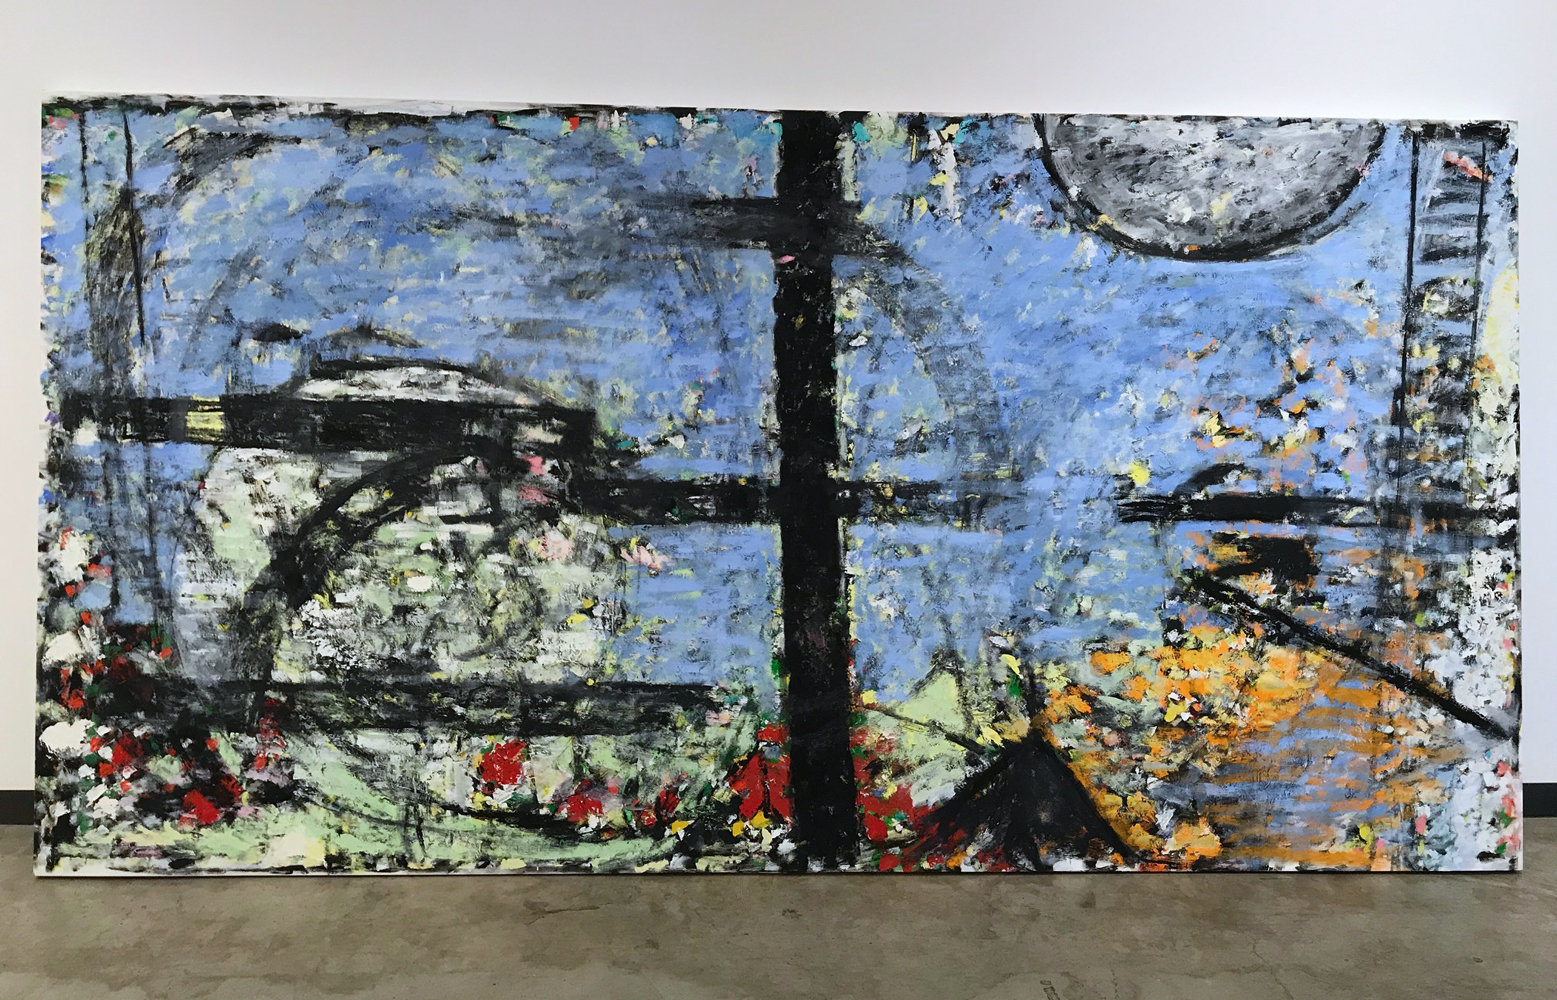 Robert C. Jones, Craig's Mill, 2003, oil on canvas, 77.75 x 150.5 inches, $35,000.